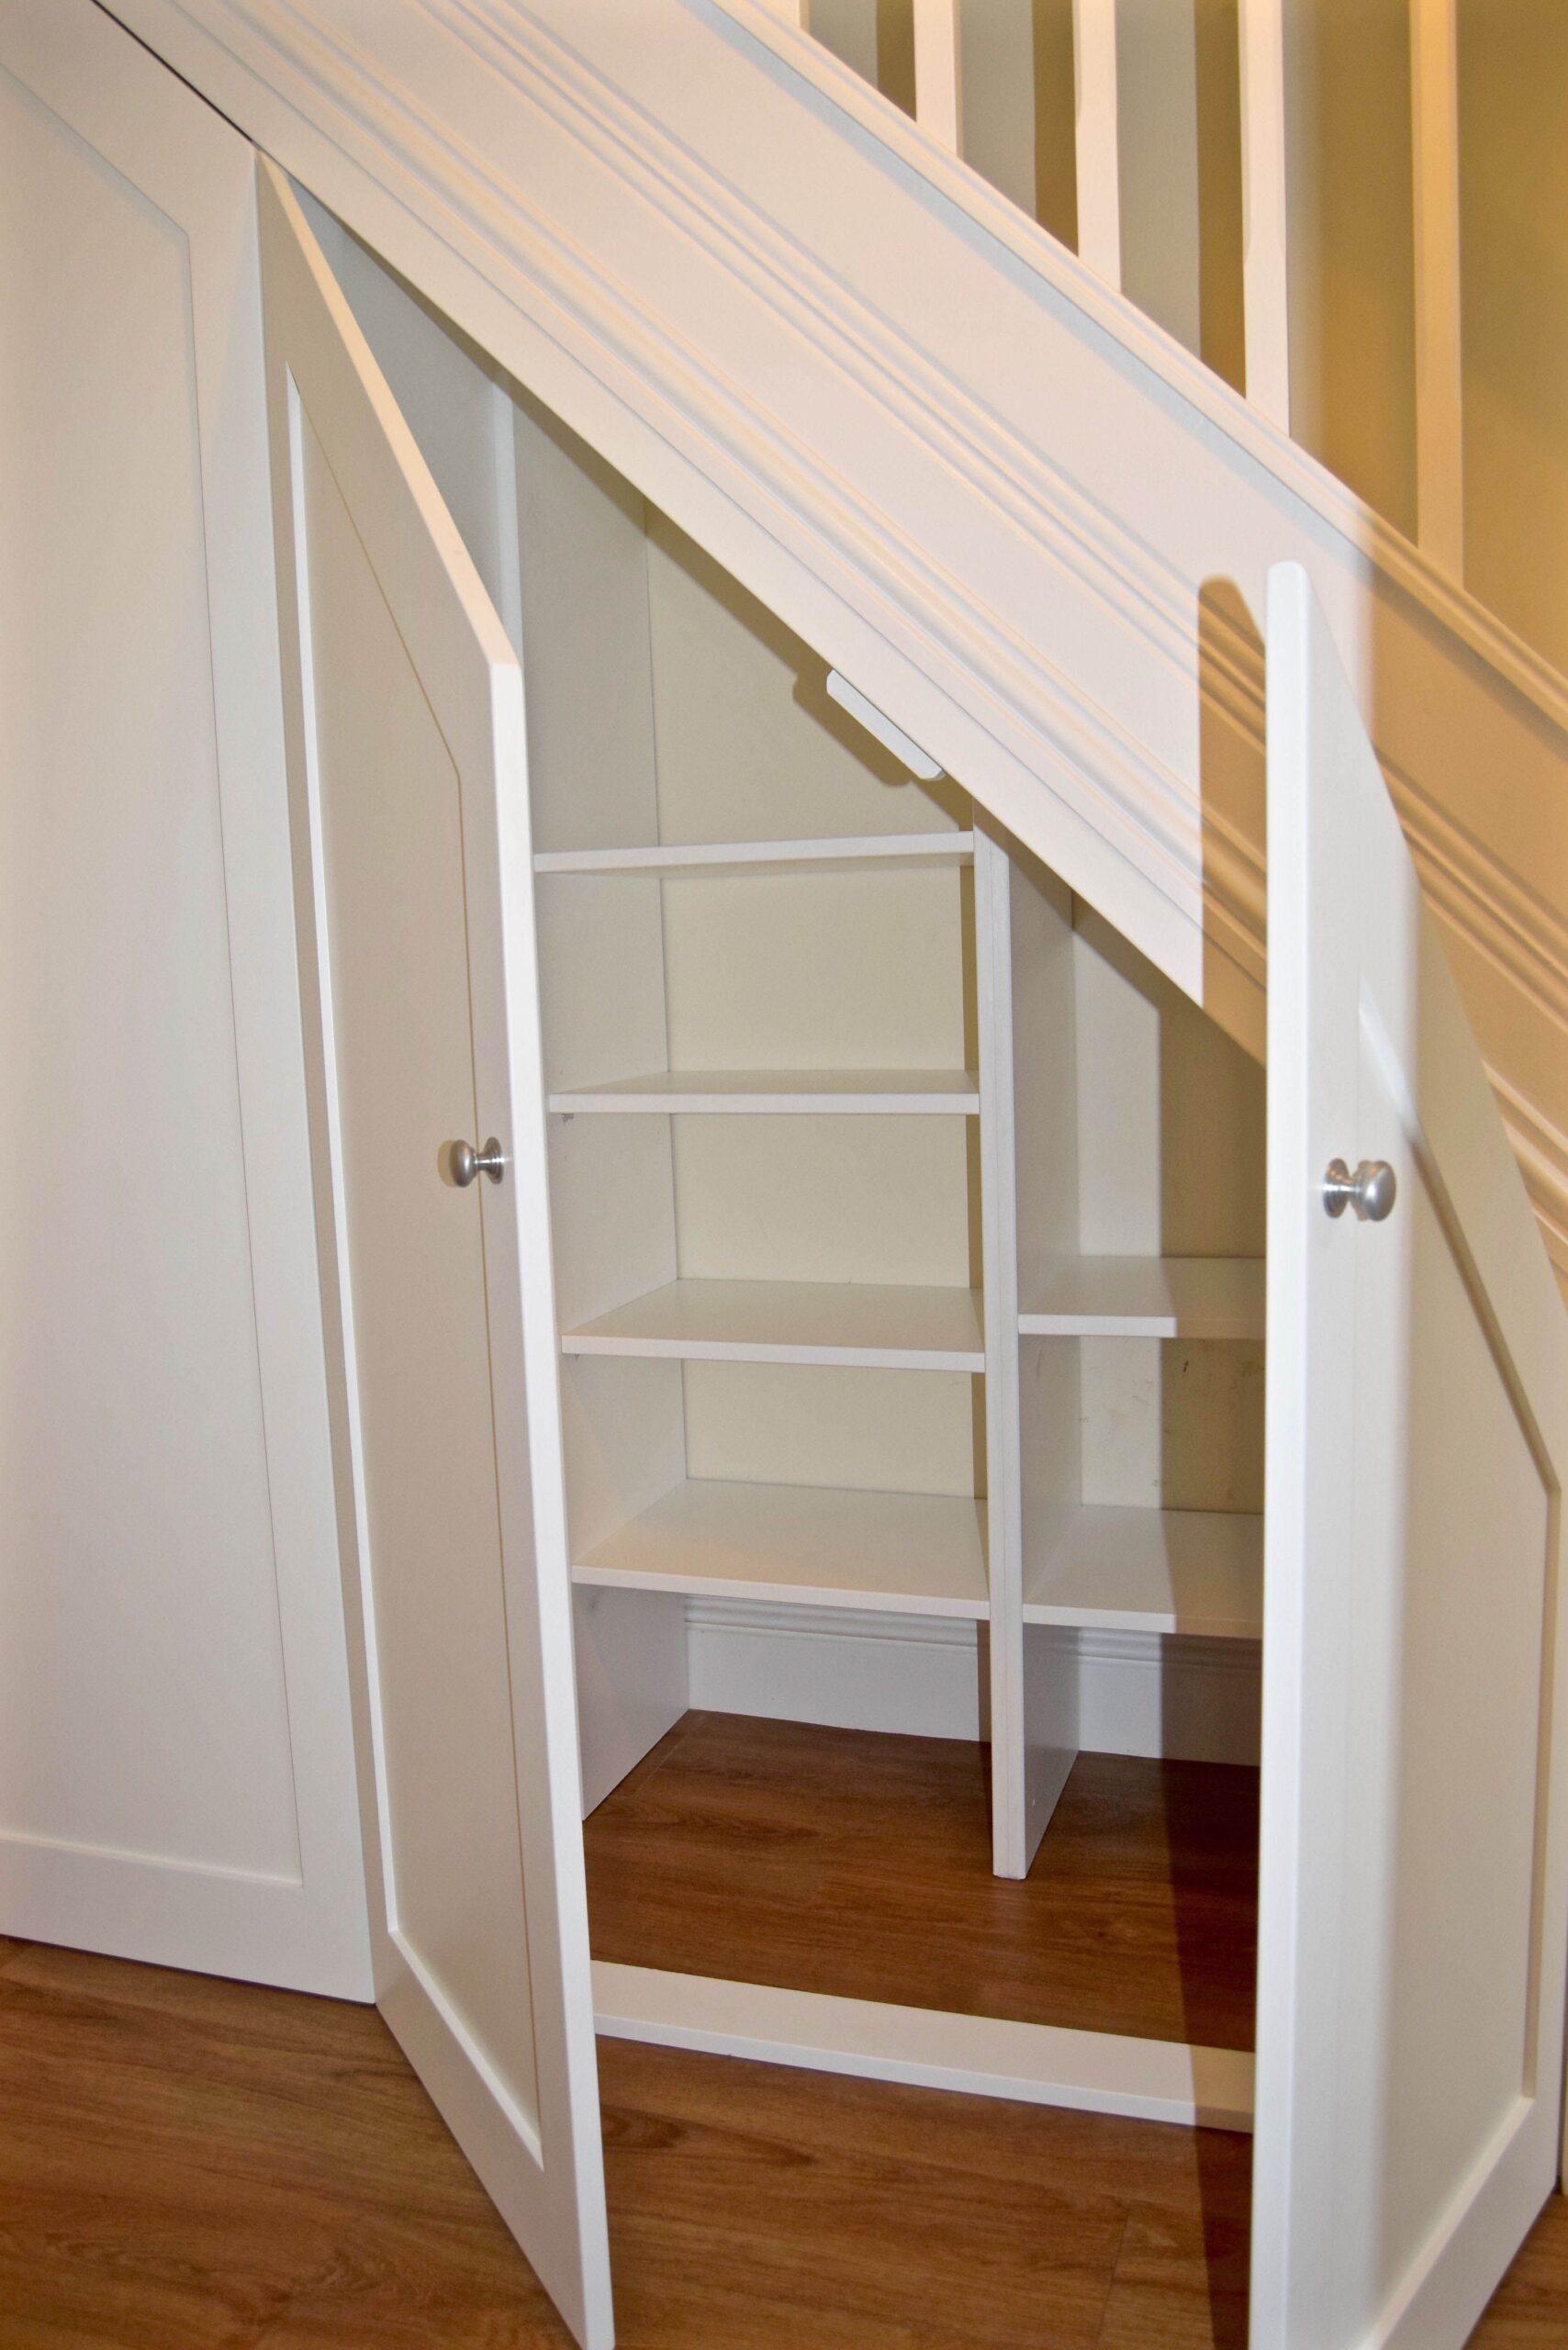 внутренняя поверхность шкафа